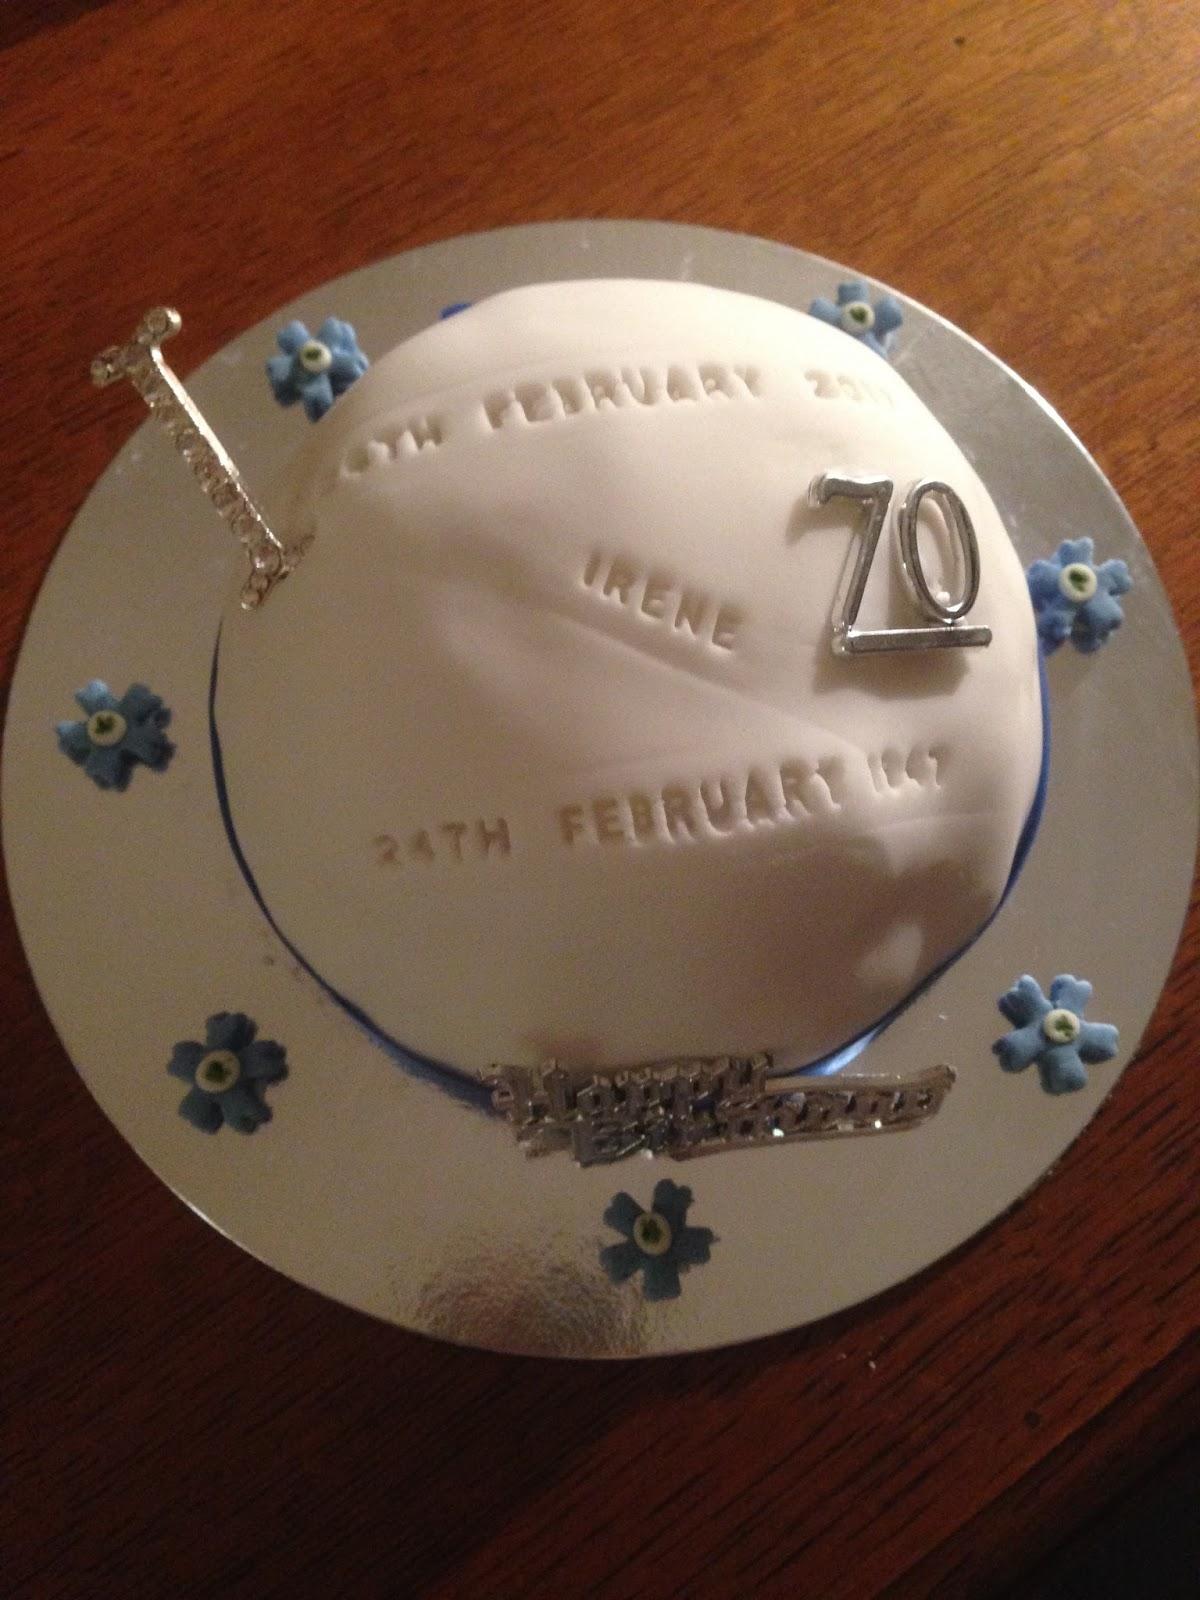 Cake Decorating 70th Birthday Cakes April 2017